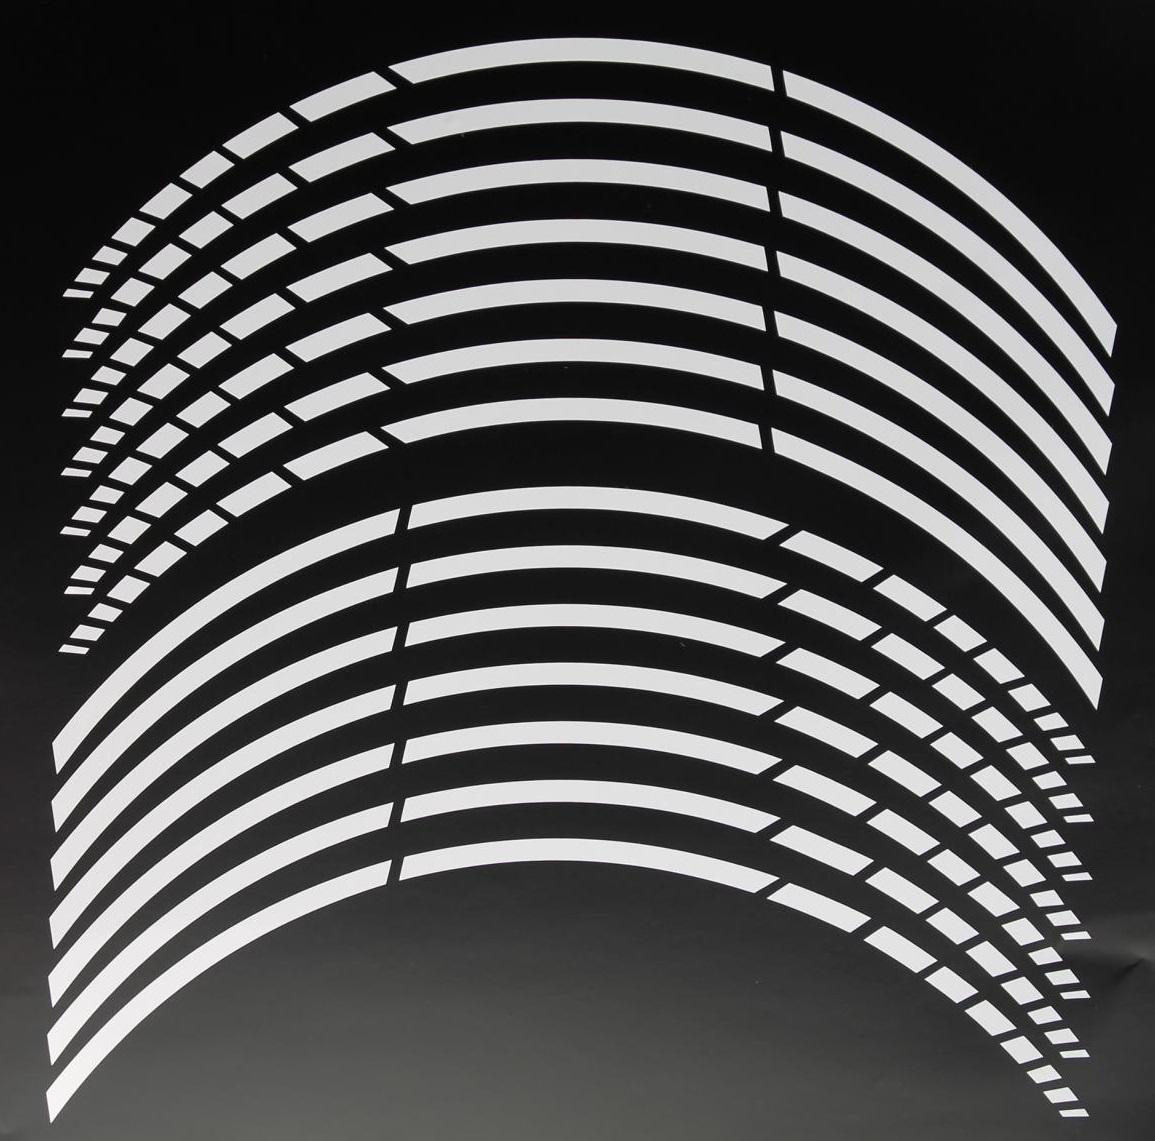 gp 20 felgenaufkleber in der farbe carbon white. Black Bedroom Furniture Sets. Home Design Ideas